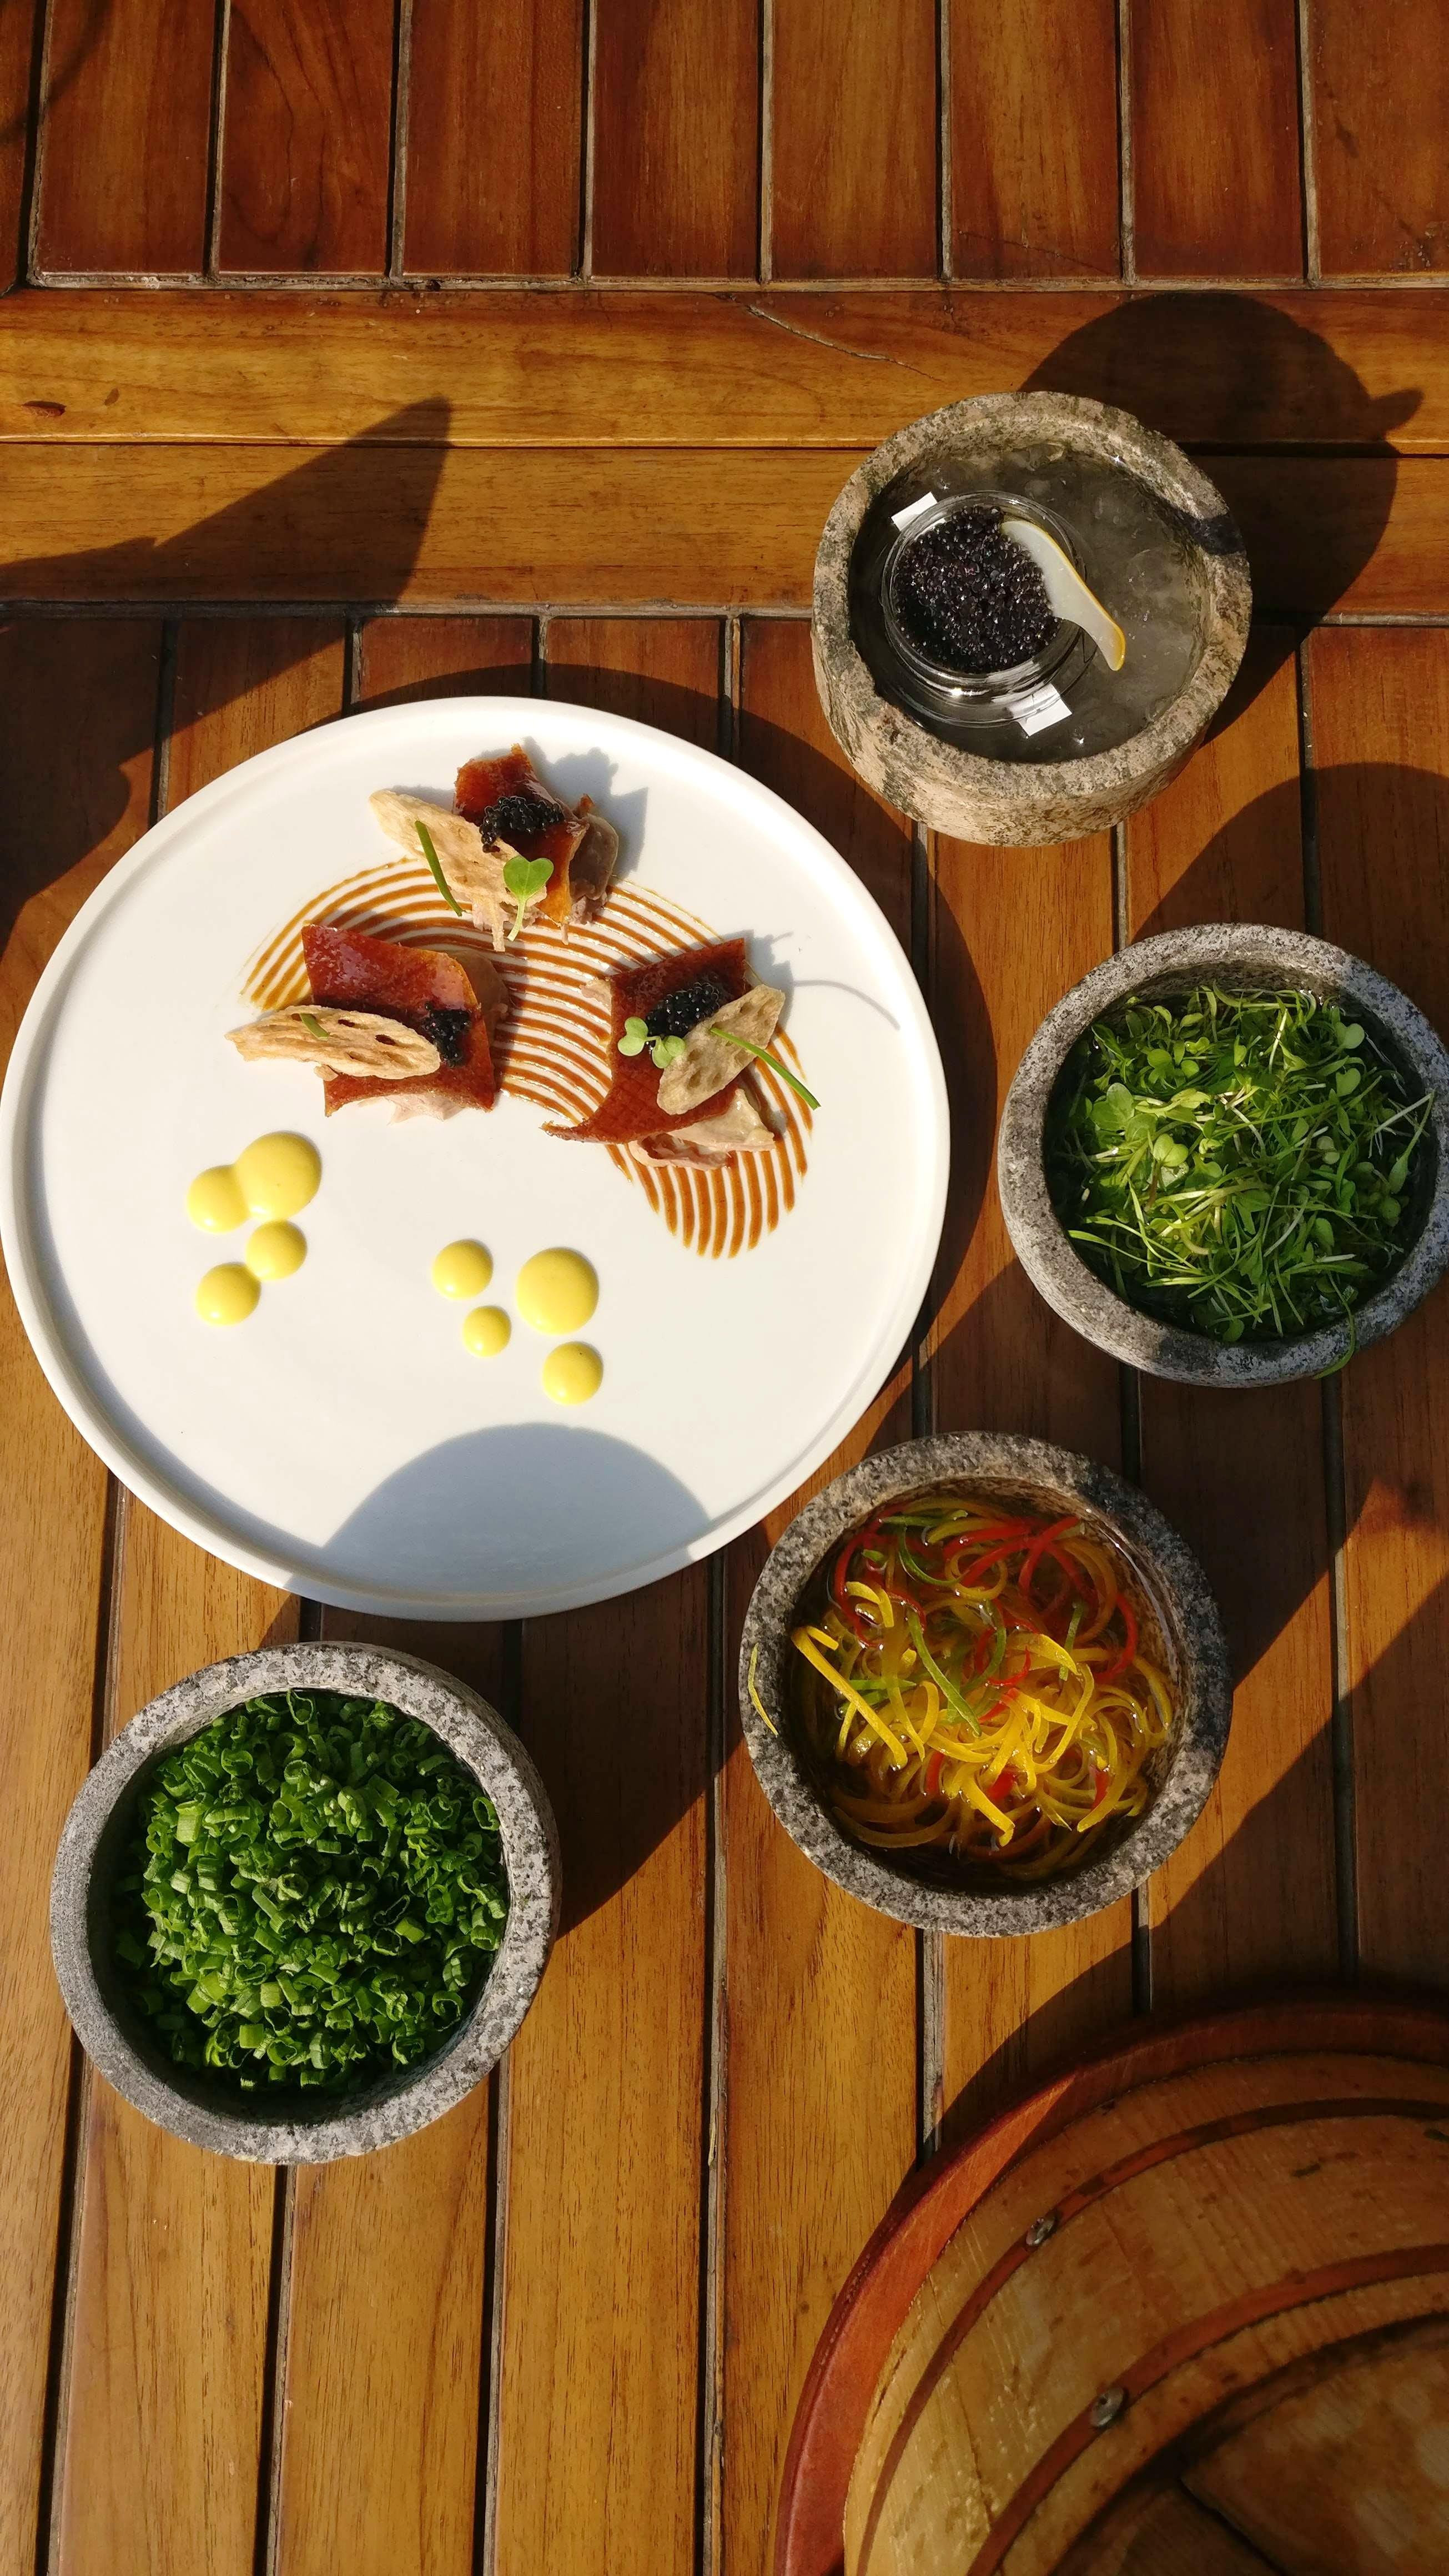 Food,Dish,Cuisine,Ingredient,Vegetarian food,Comfort food,Meal,Recipe,Side dish,Produce